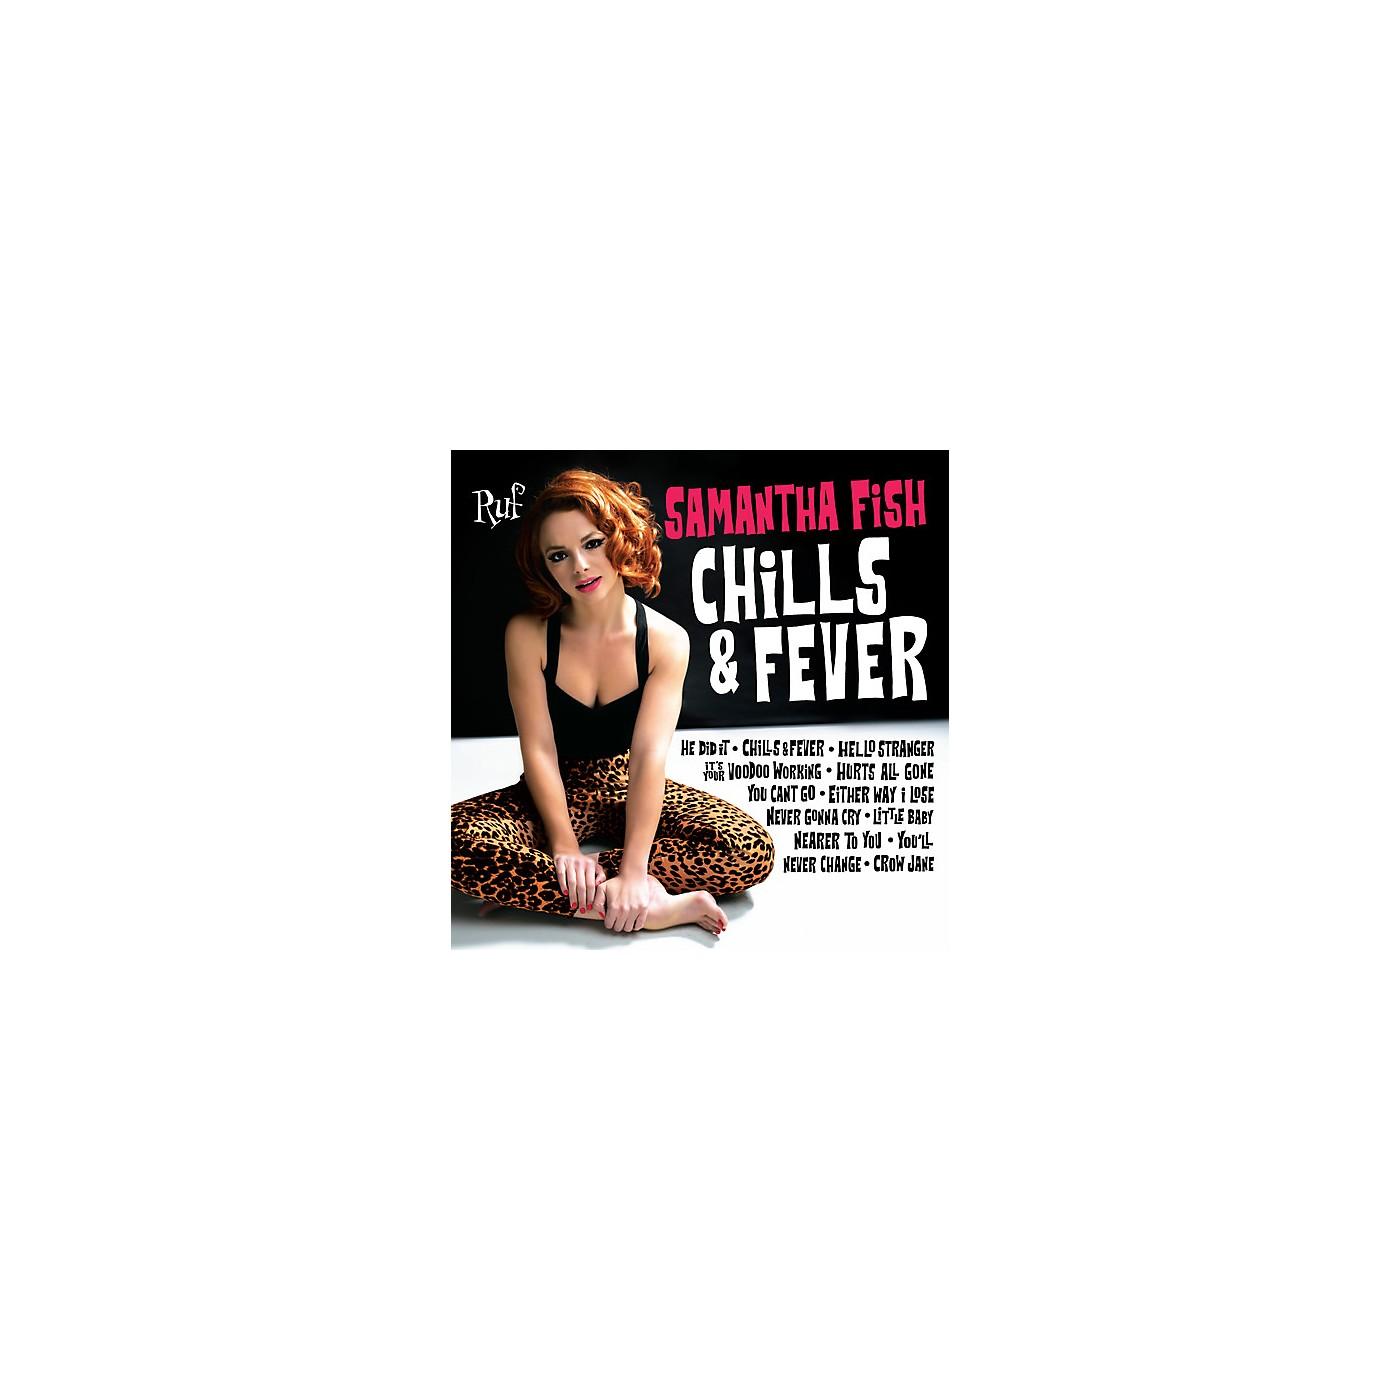 Alliance Samantha Fish - Chills & Fever thumbnail